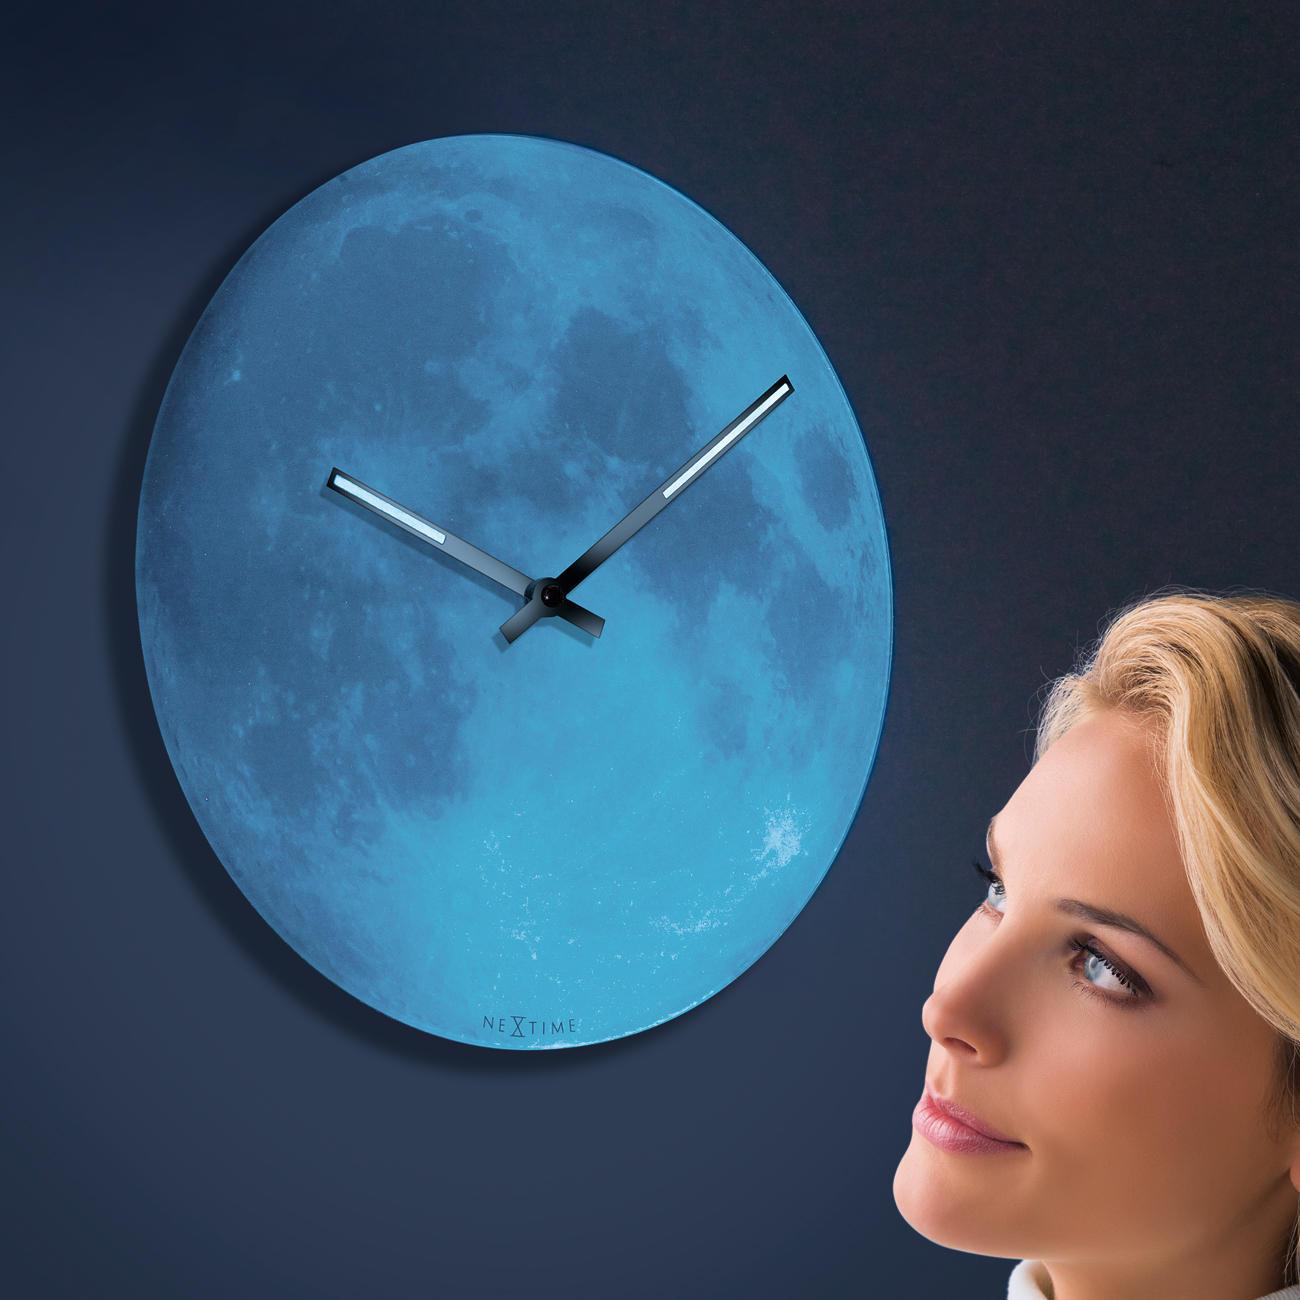 wanduhr blue moon 3 jahre garantie pro idee. Black Bedroom Furniture Sets. Home Design Ideas